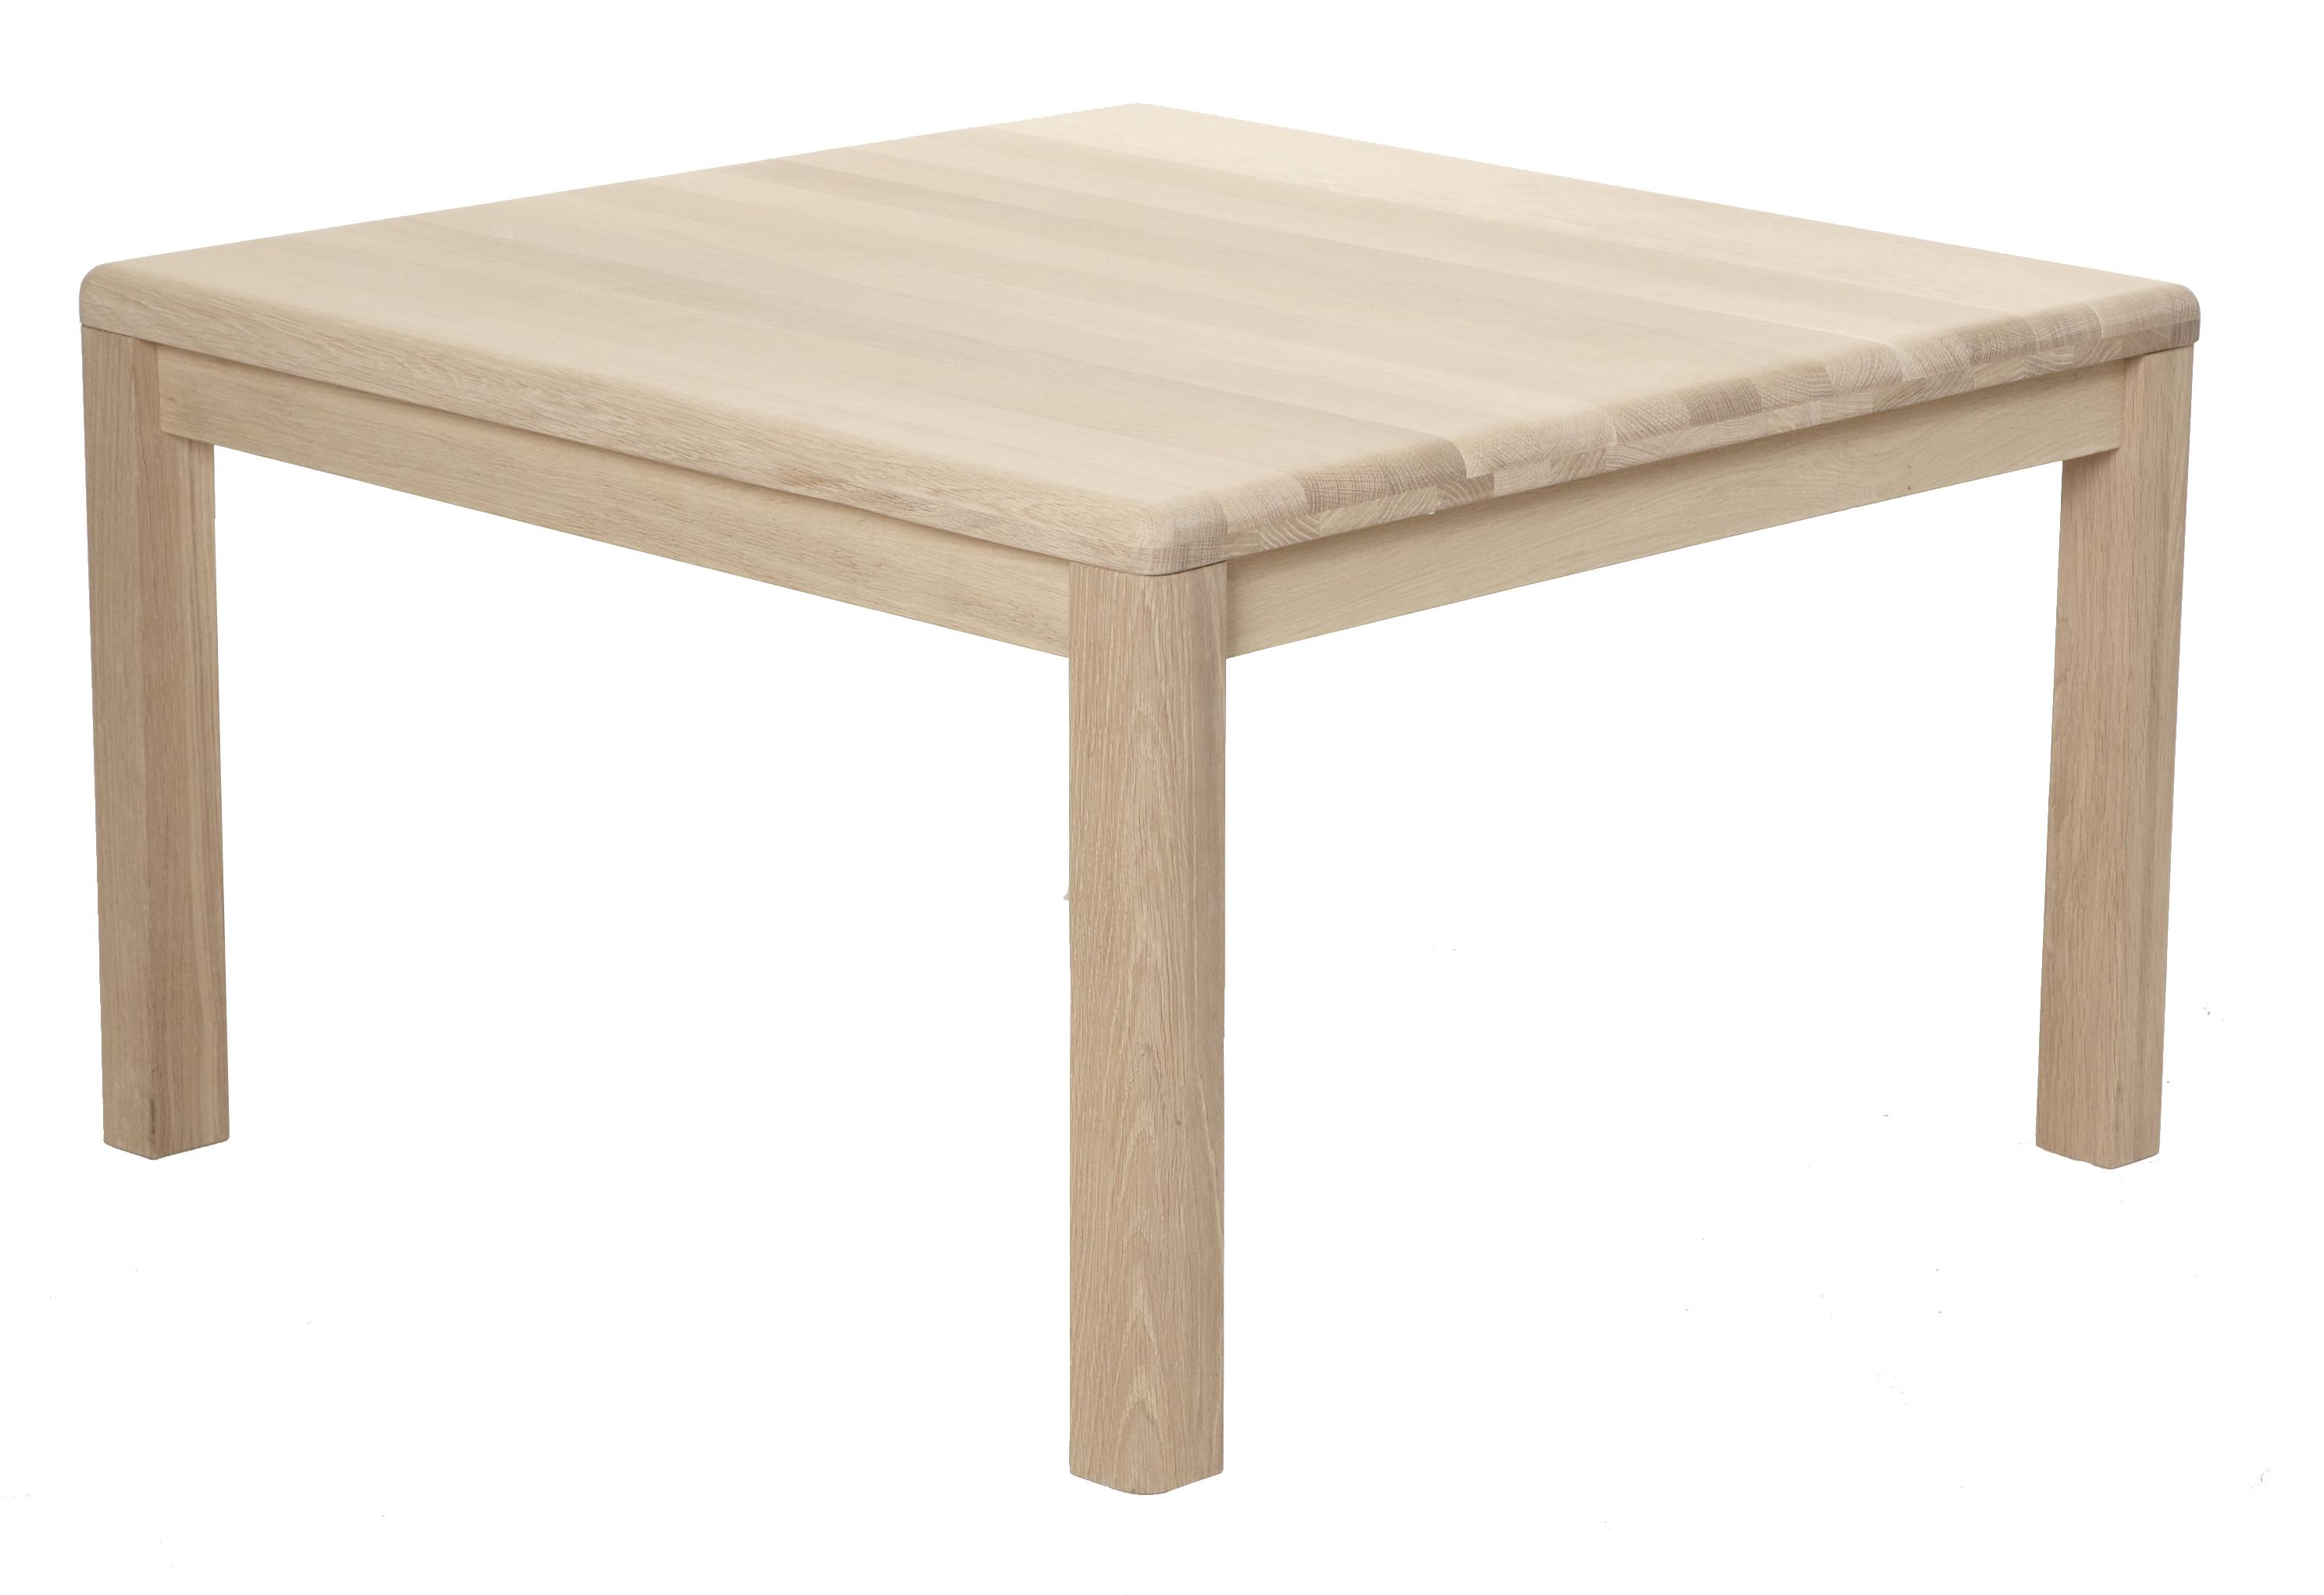 Lina sofabord - massiv egetr, kvadratisk